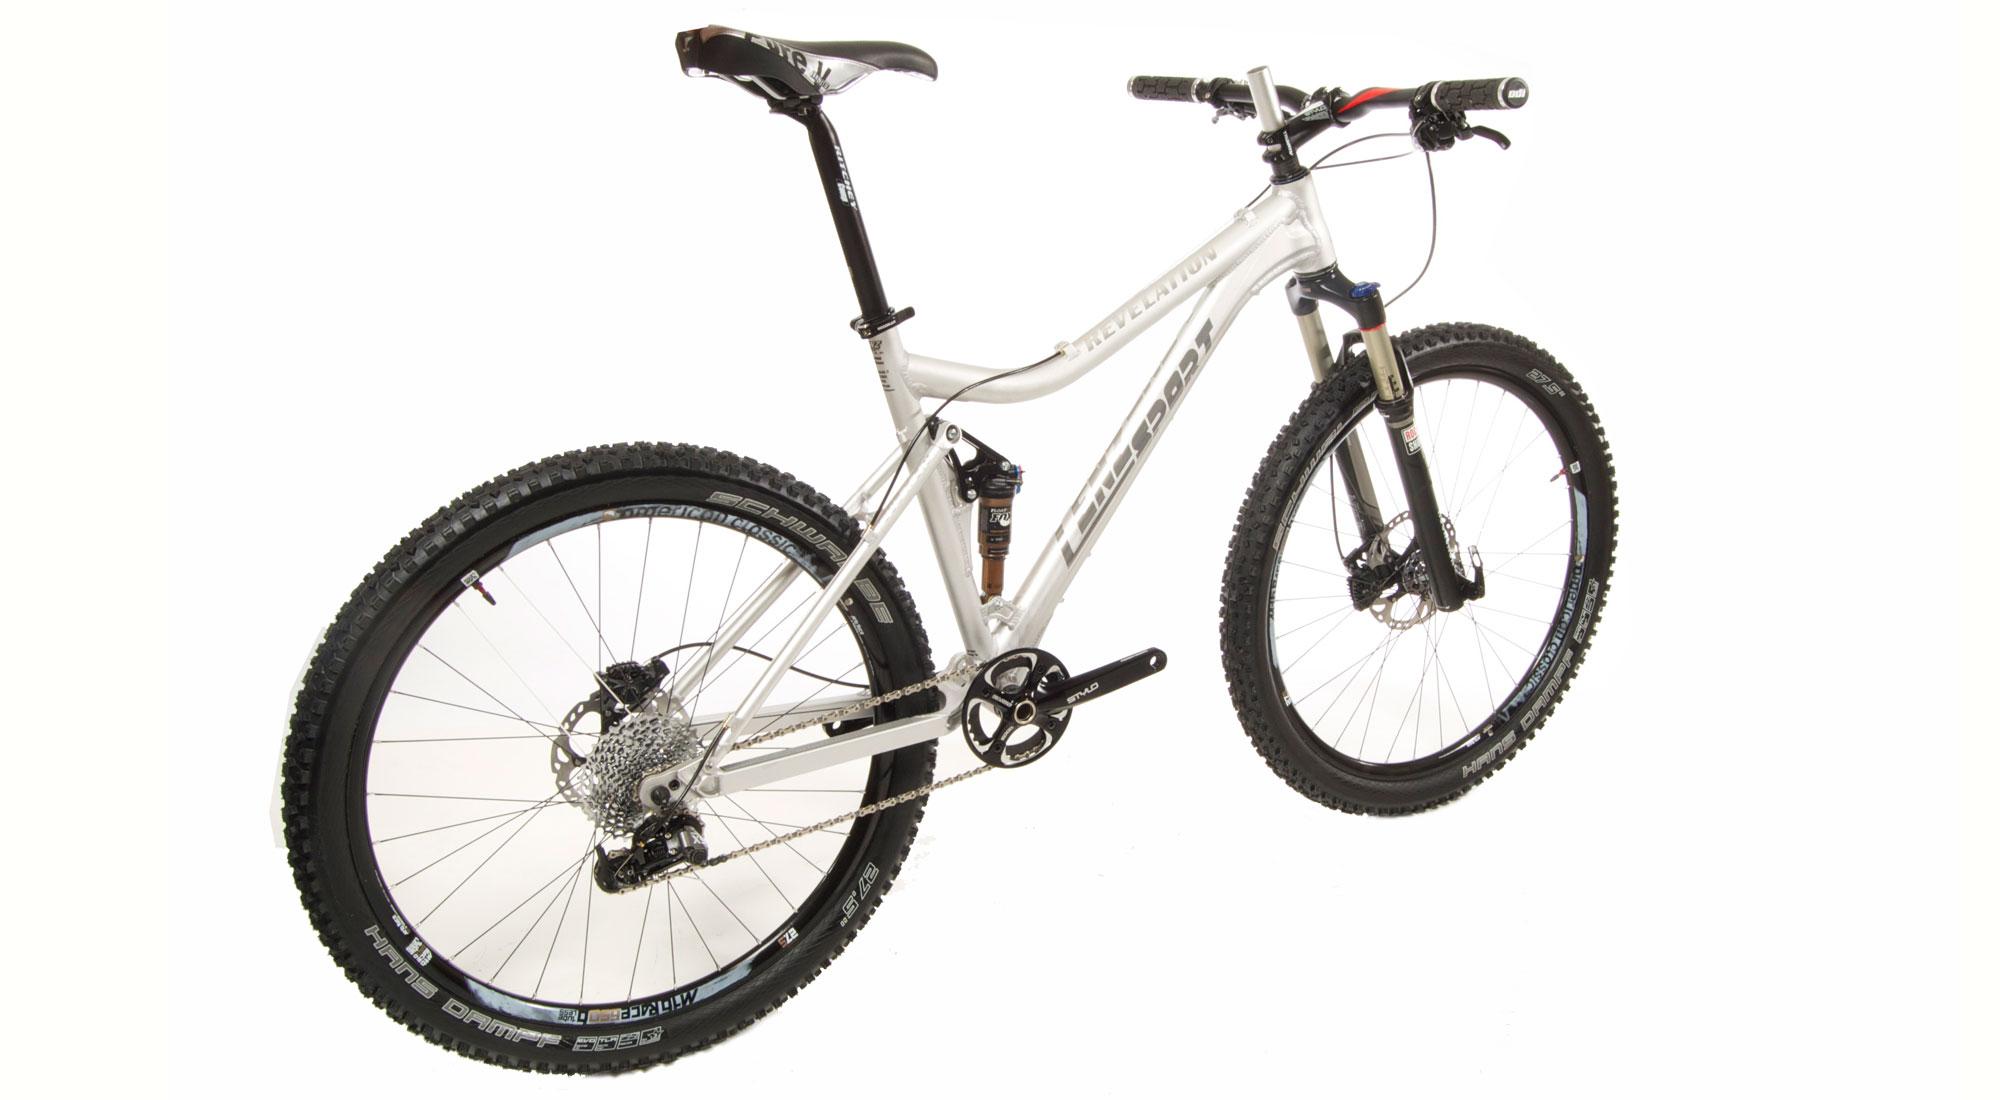 Revelation-650b-ISO-rear-silver2000x1100px